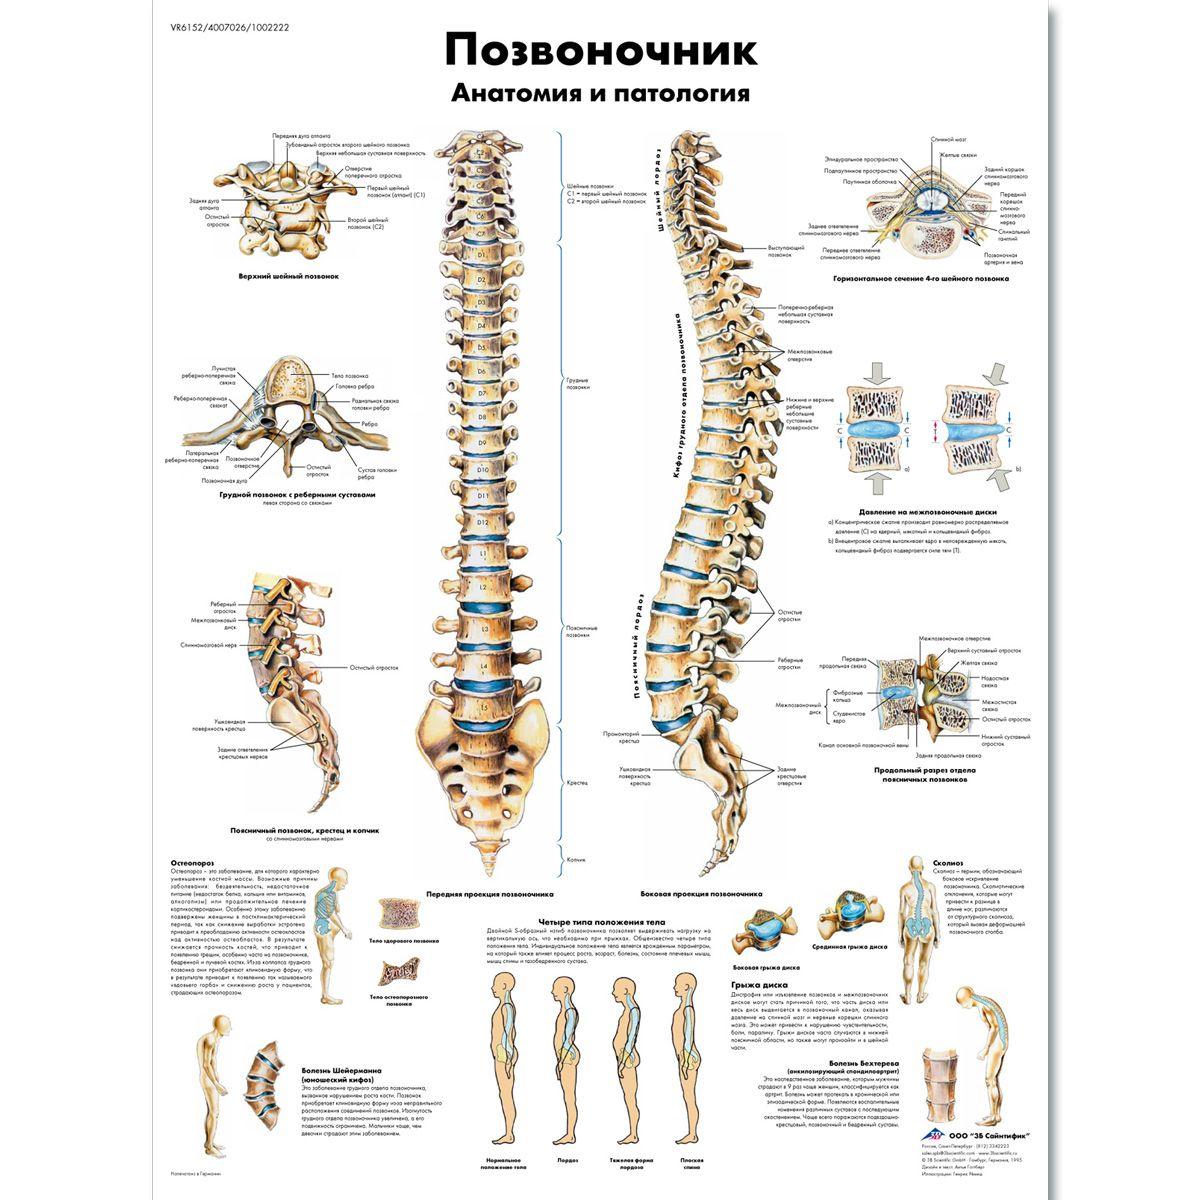 ZVR6152L_01_1200_1200_Медицинский-плакат-Позвоночник-человека.jpg ...